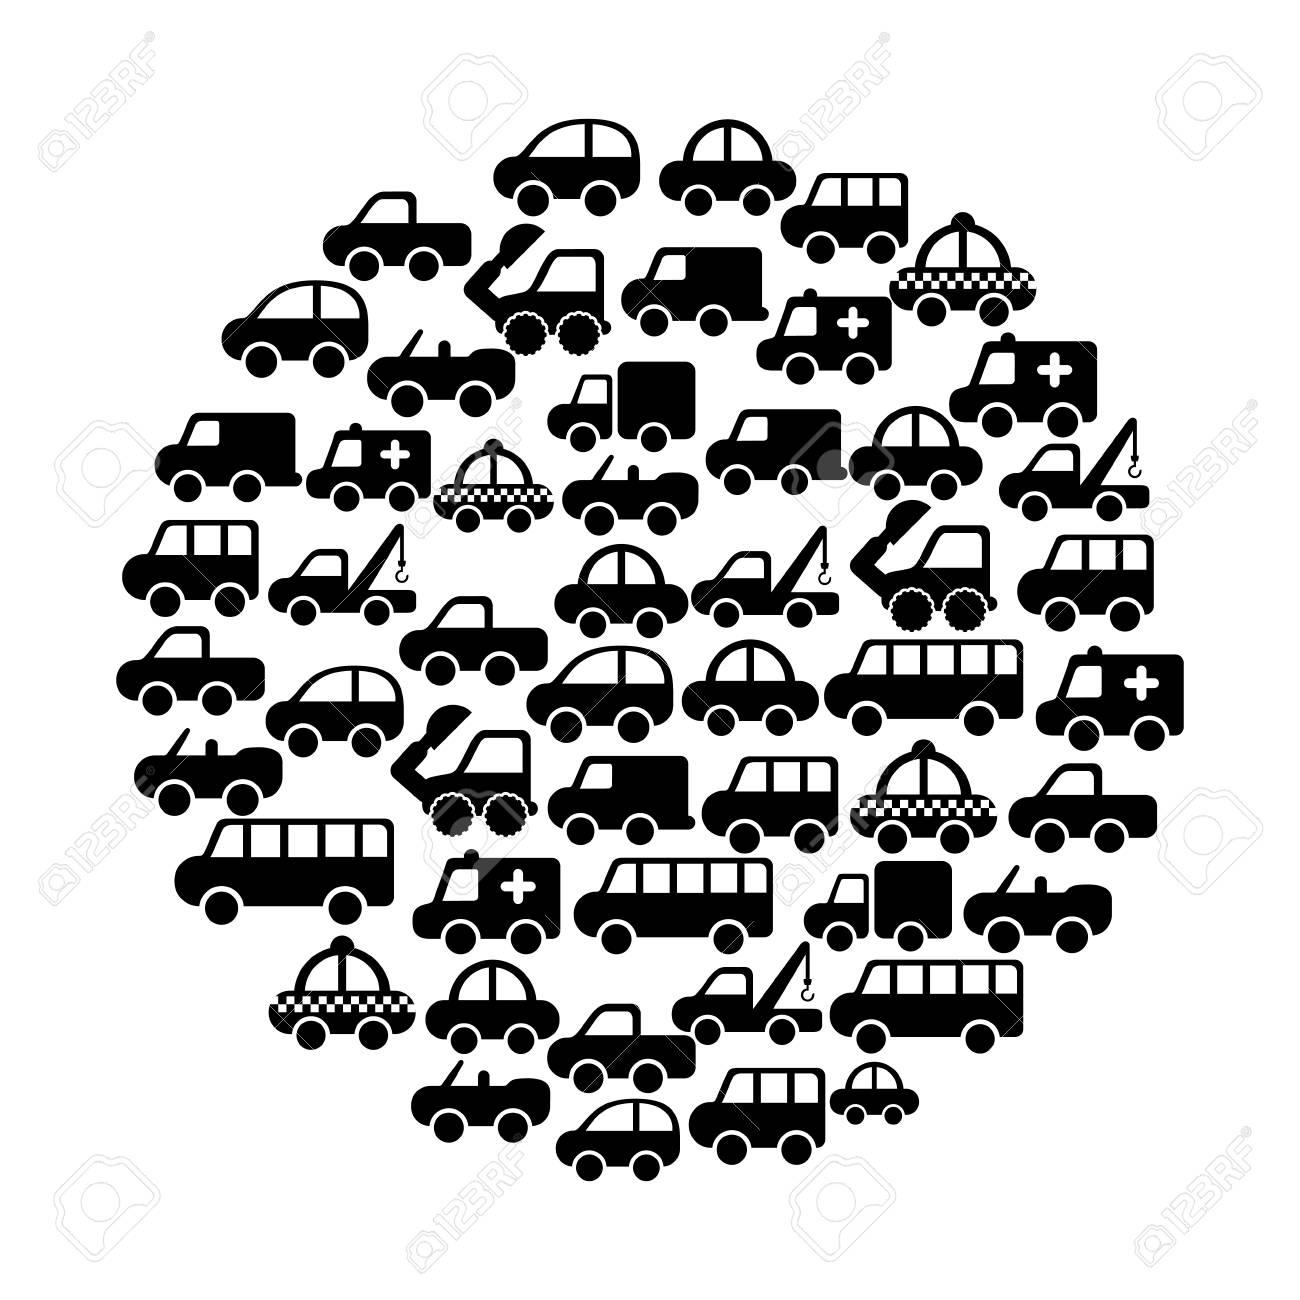 cars design over white background vector illustration Stock Vector - 22311037